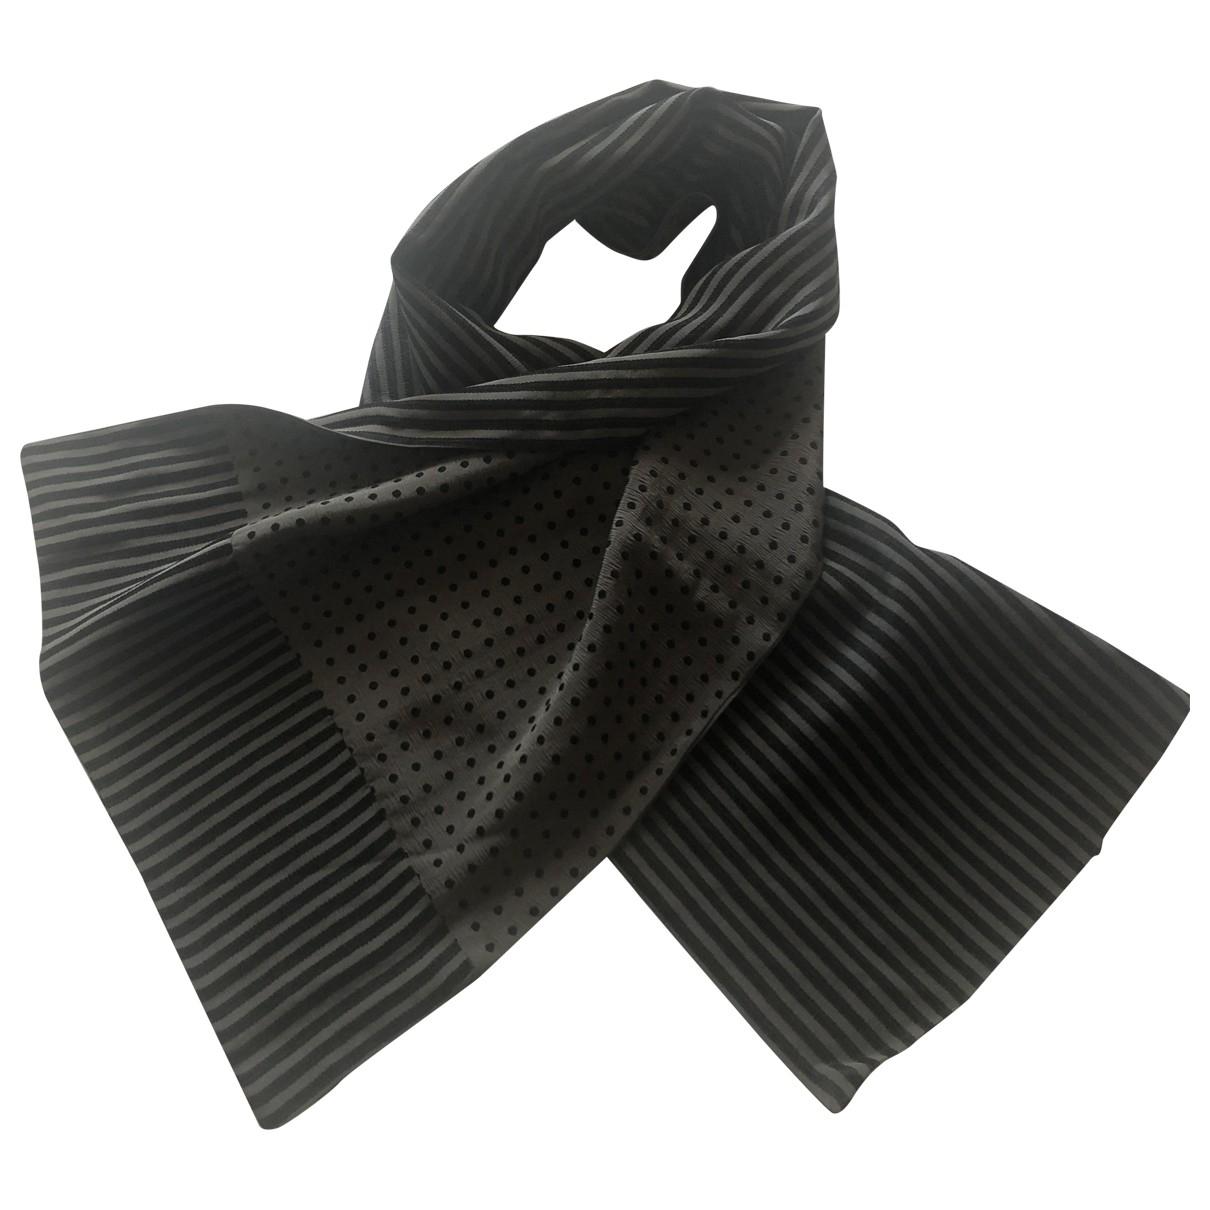 Giorgio Armani - Cheches.Echarpes   pour homme en soie - gris